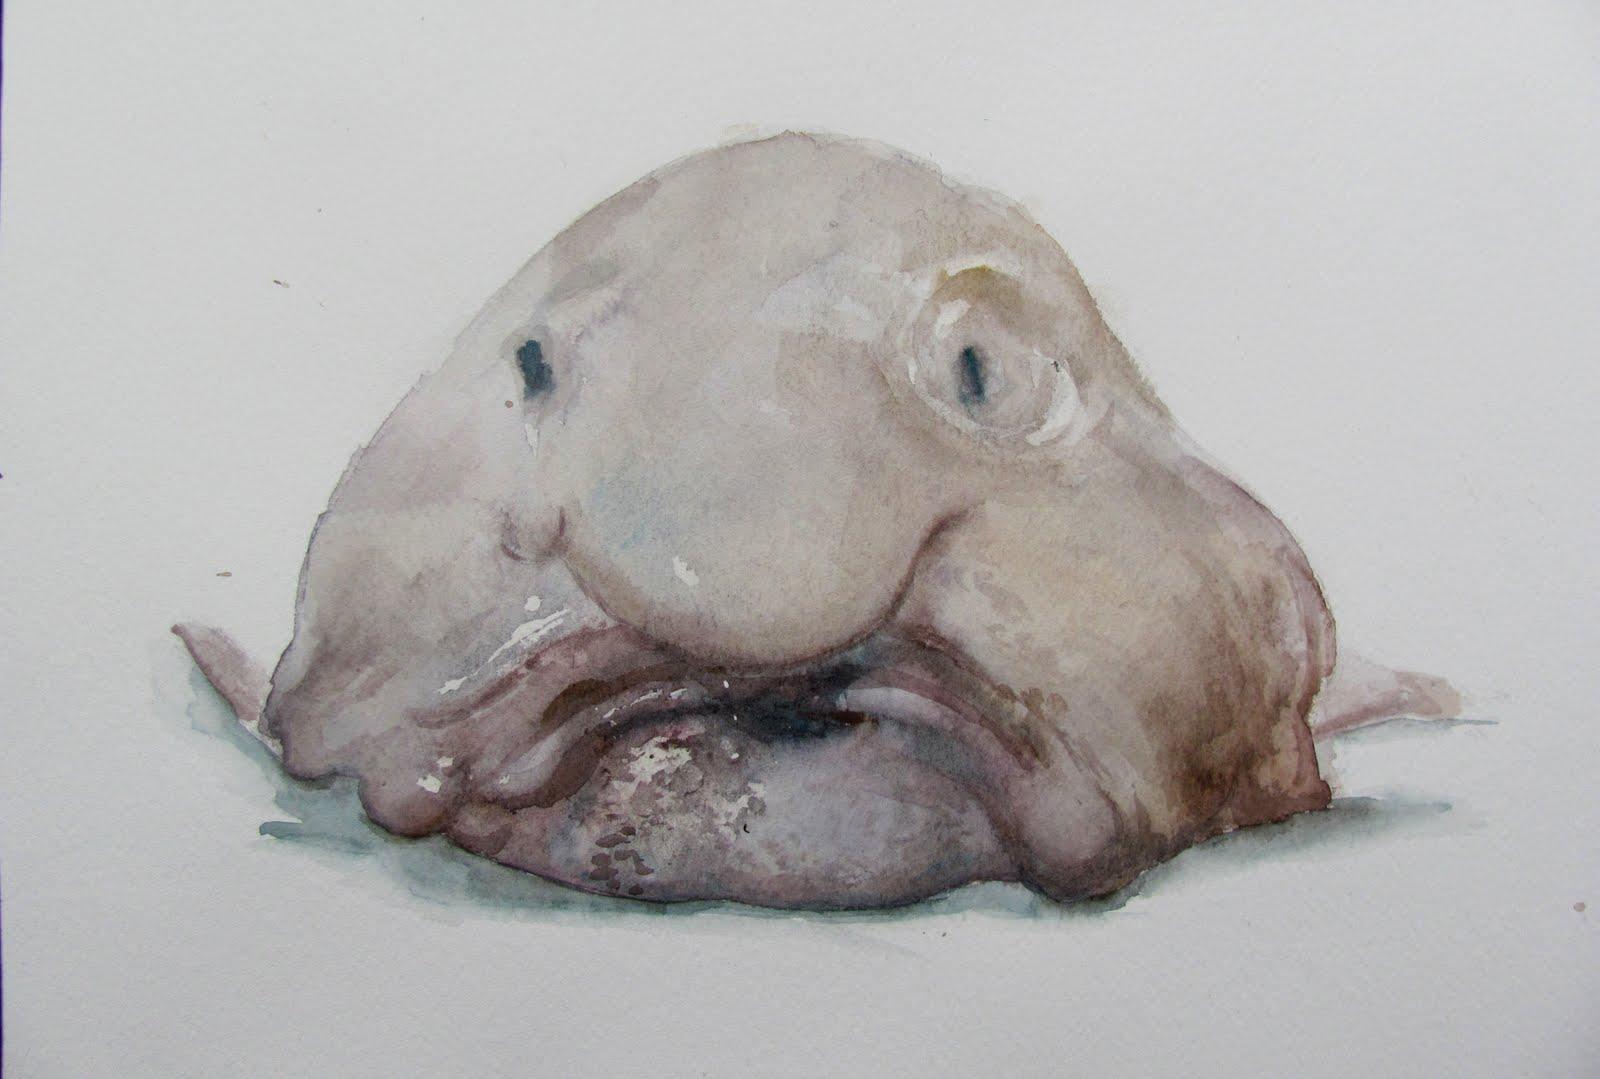 blob fish interesting facts